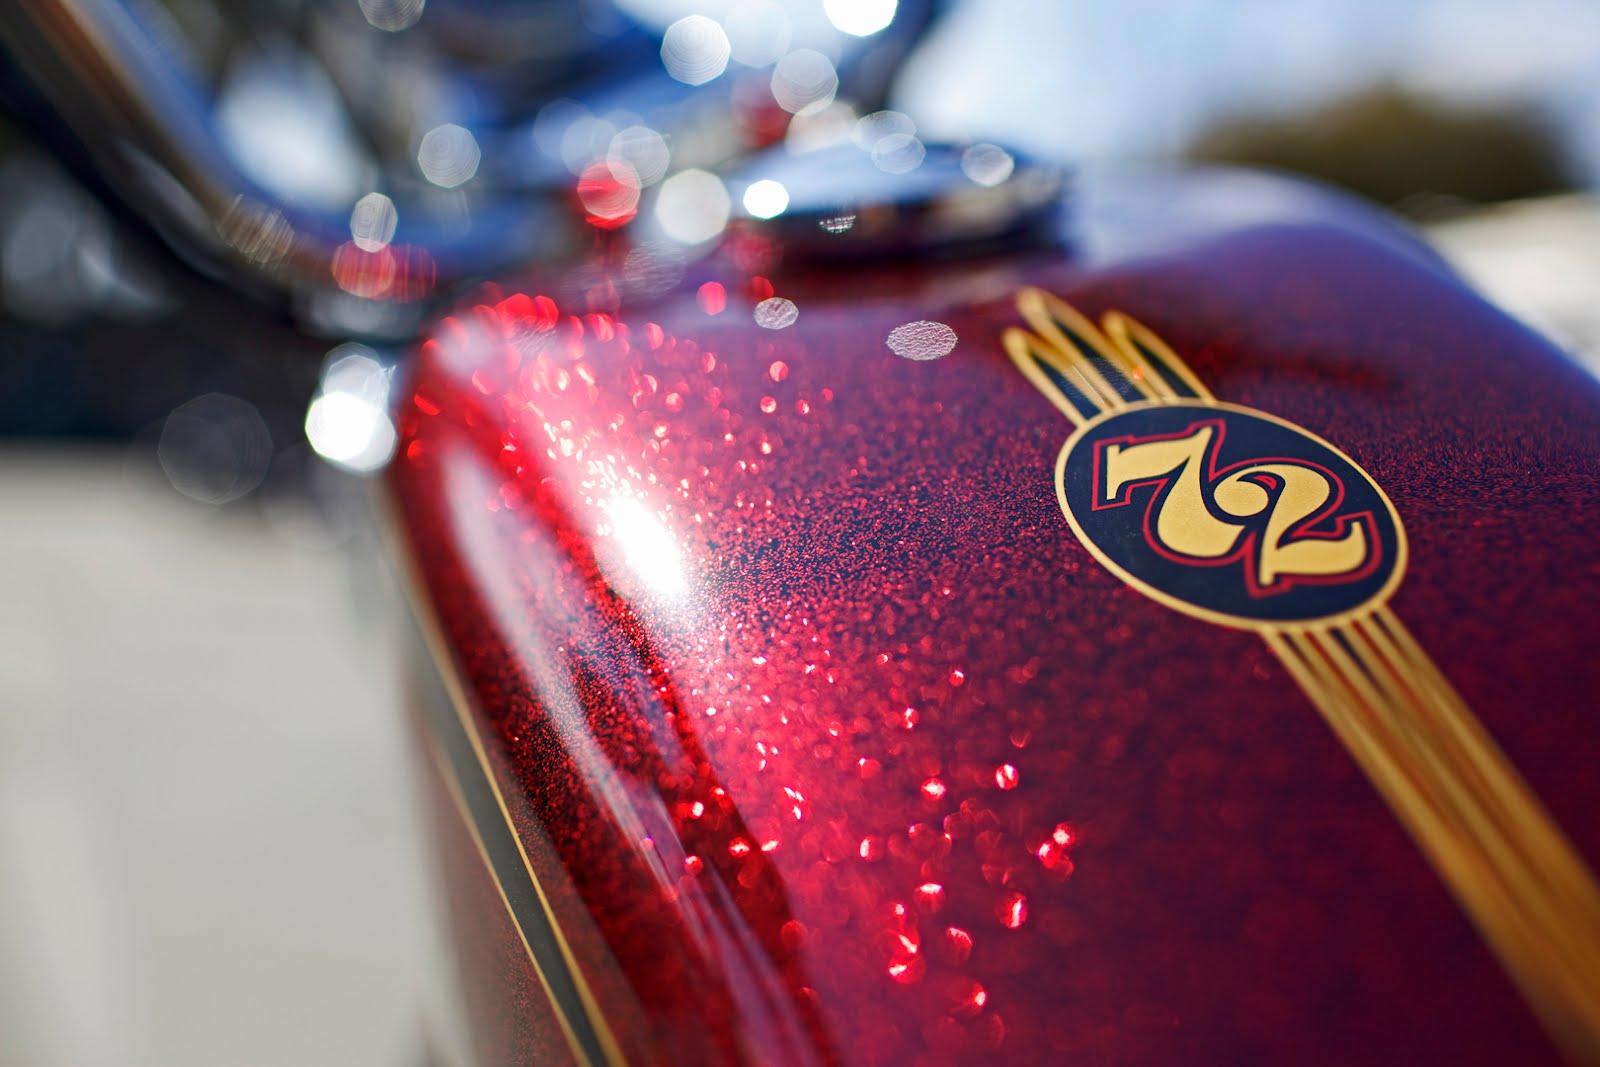 Sunlite Red Bike Shop Mechanics Garage Towels CLOTH RED COTTON //// 50 PACK